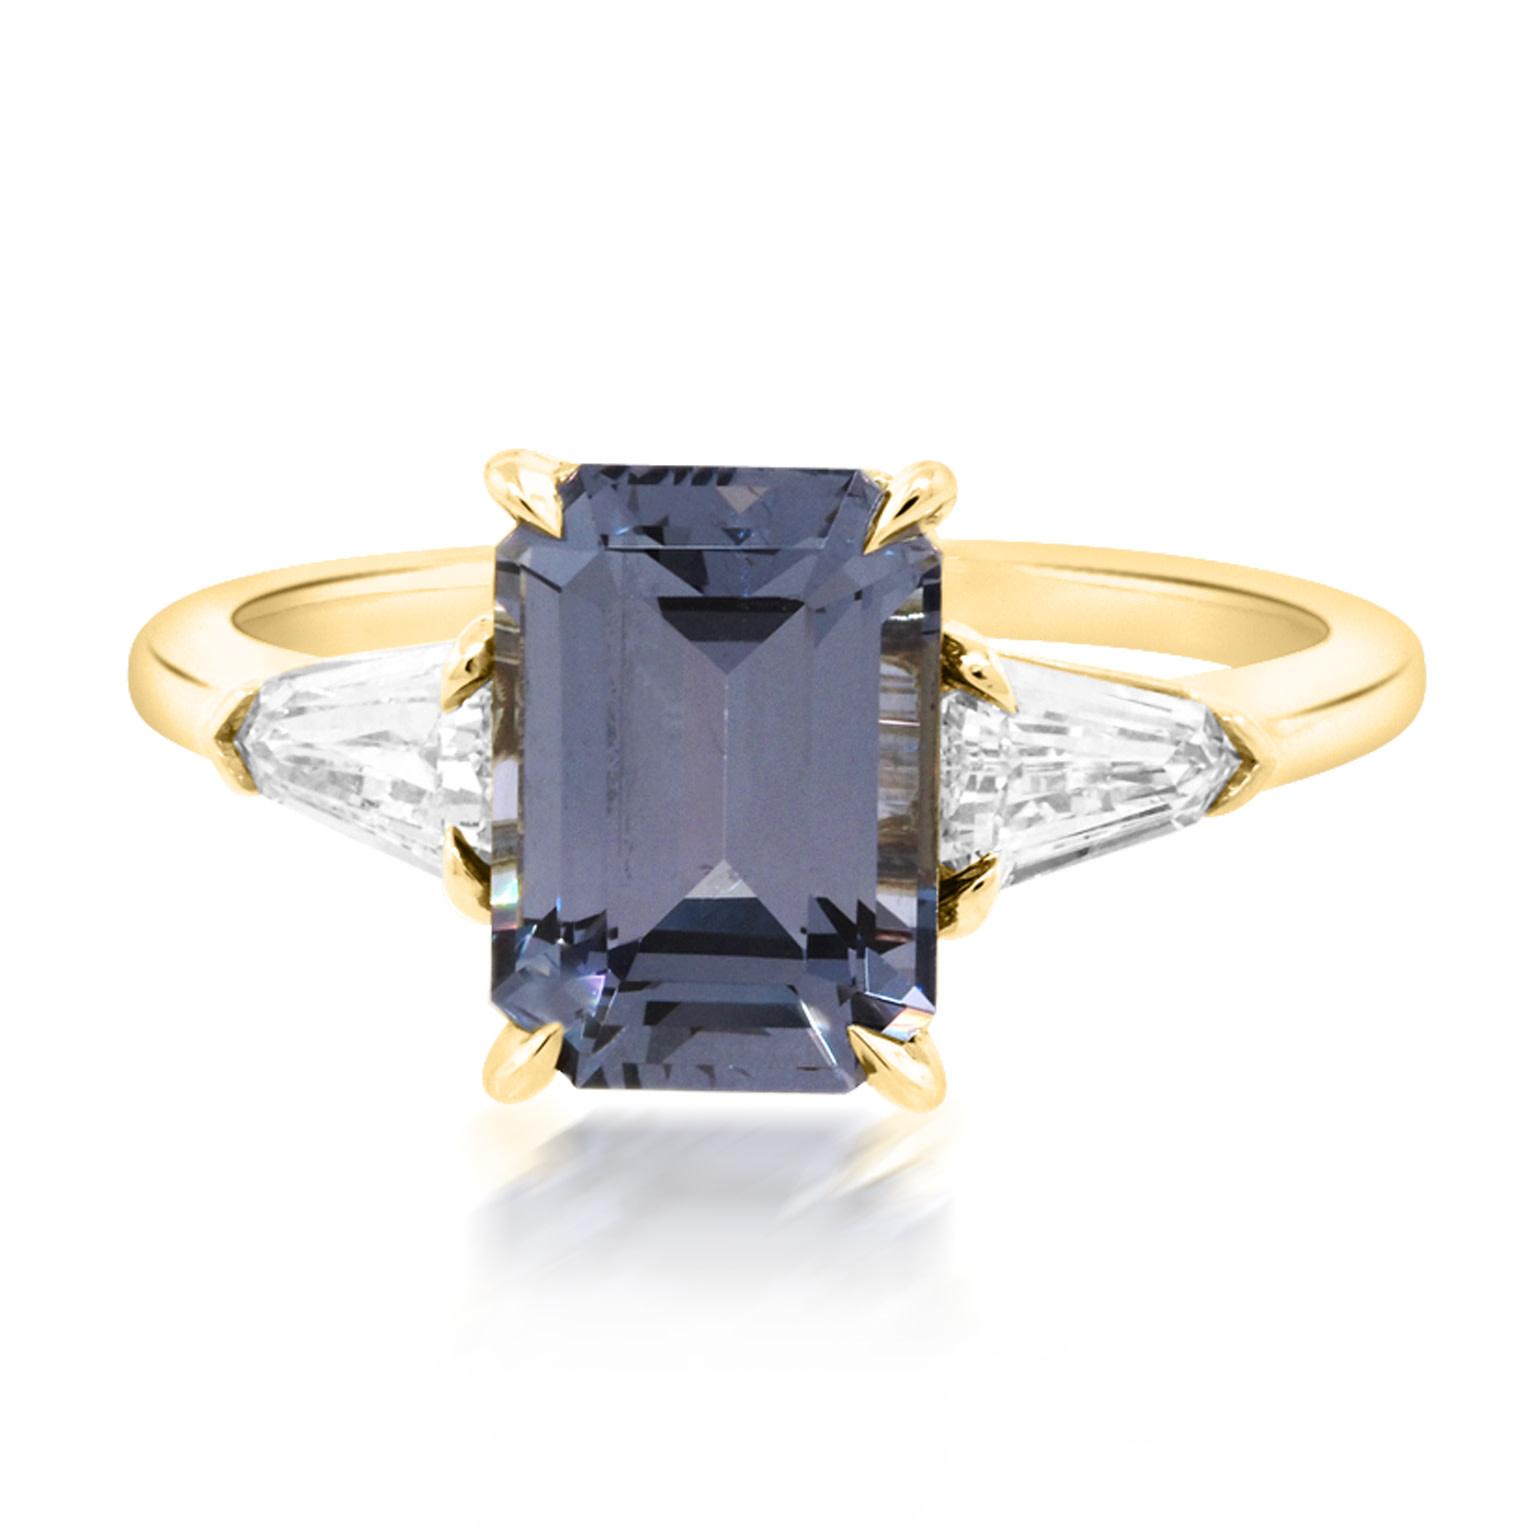 Trabert Goldsmiths 2.52ct Blue Spinel Trinity Ring